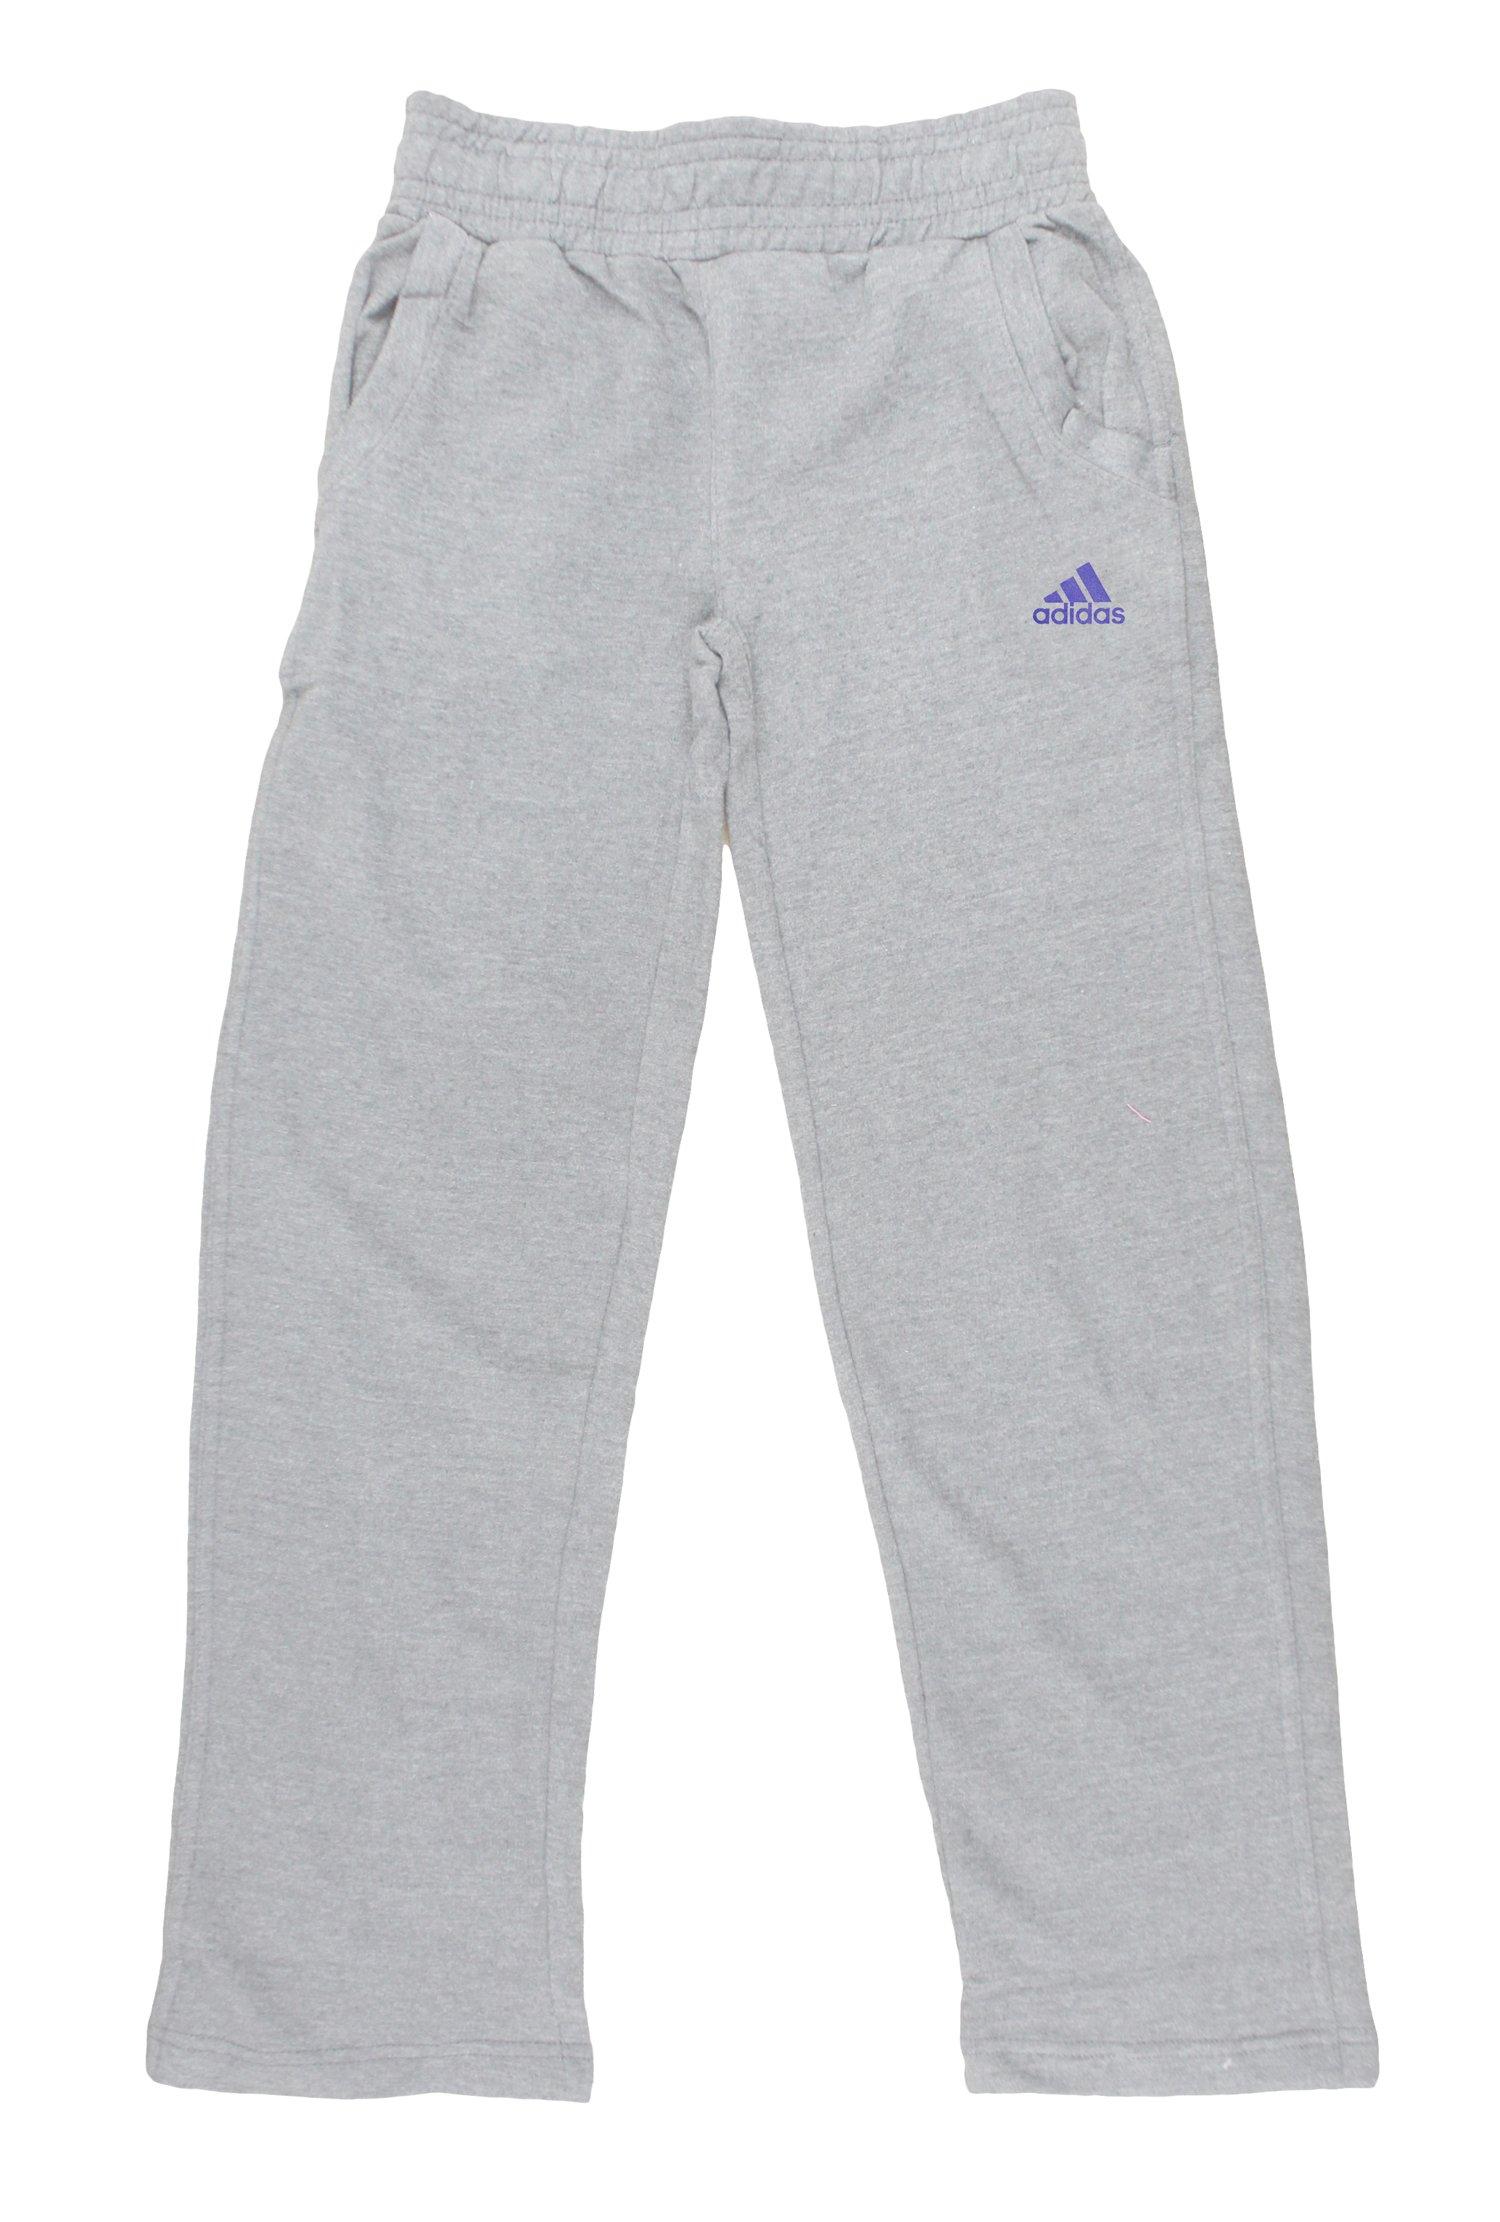 Adidas Big Girls Cotton Fleece Pants (Large (14), Medium Grey)